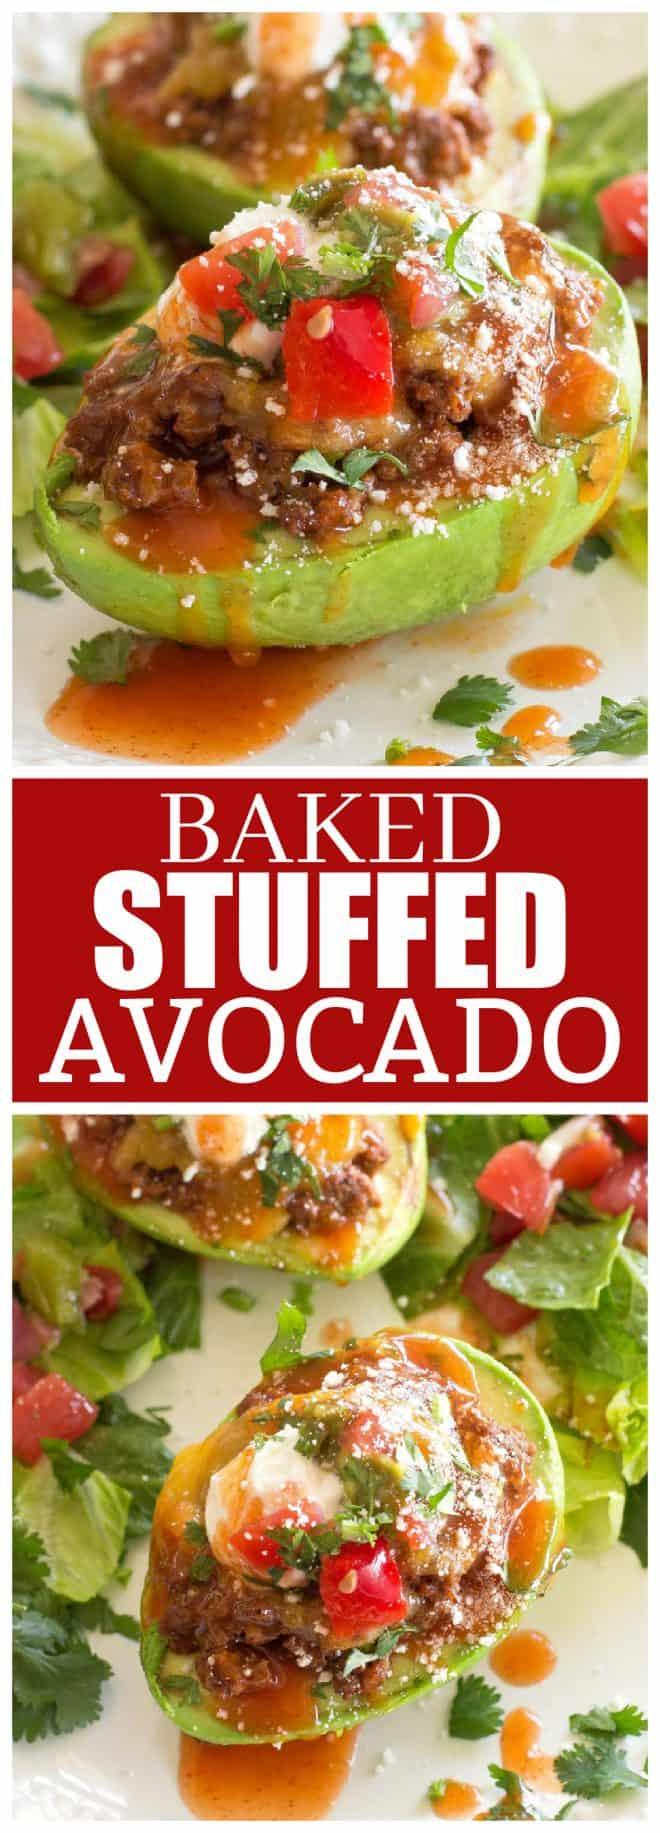 baked stuffed avocado